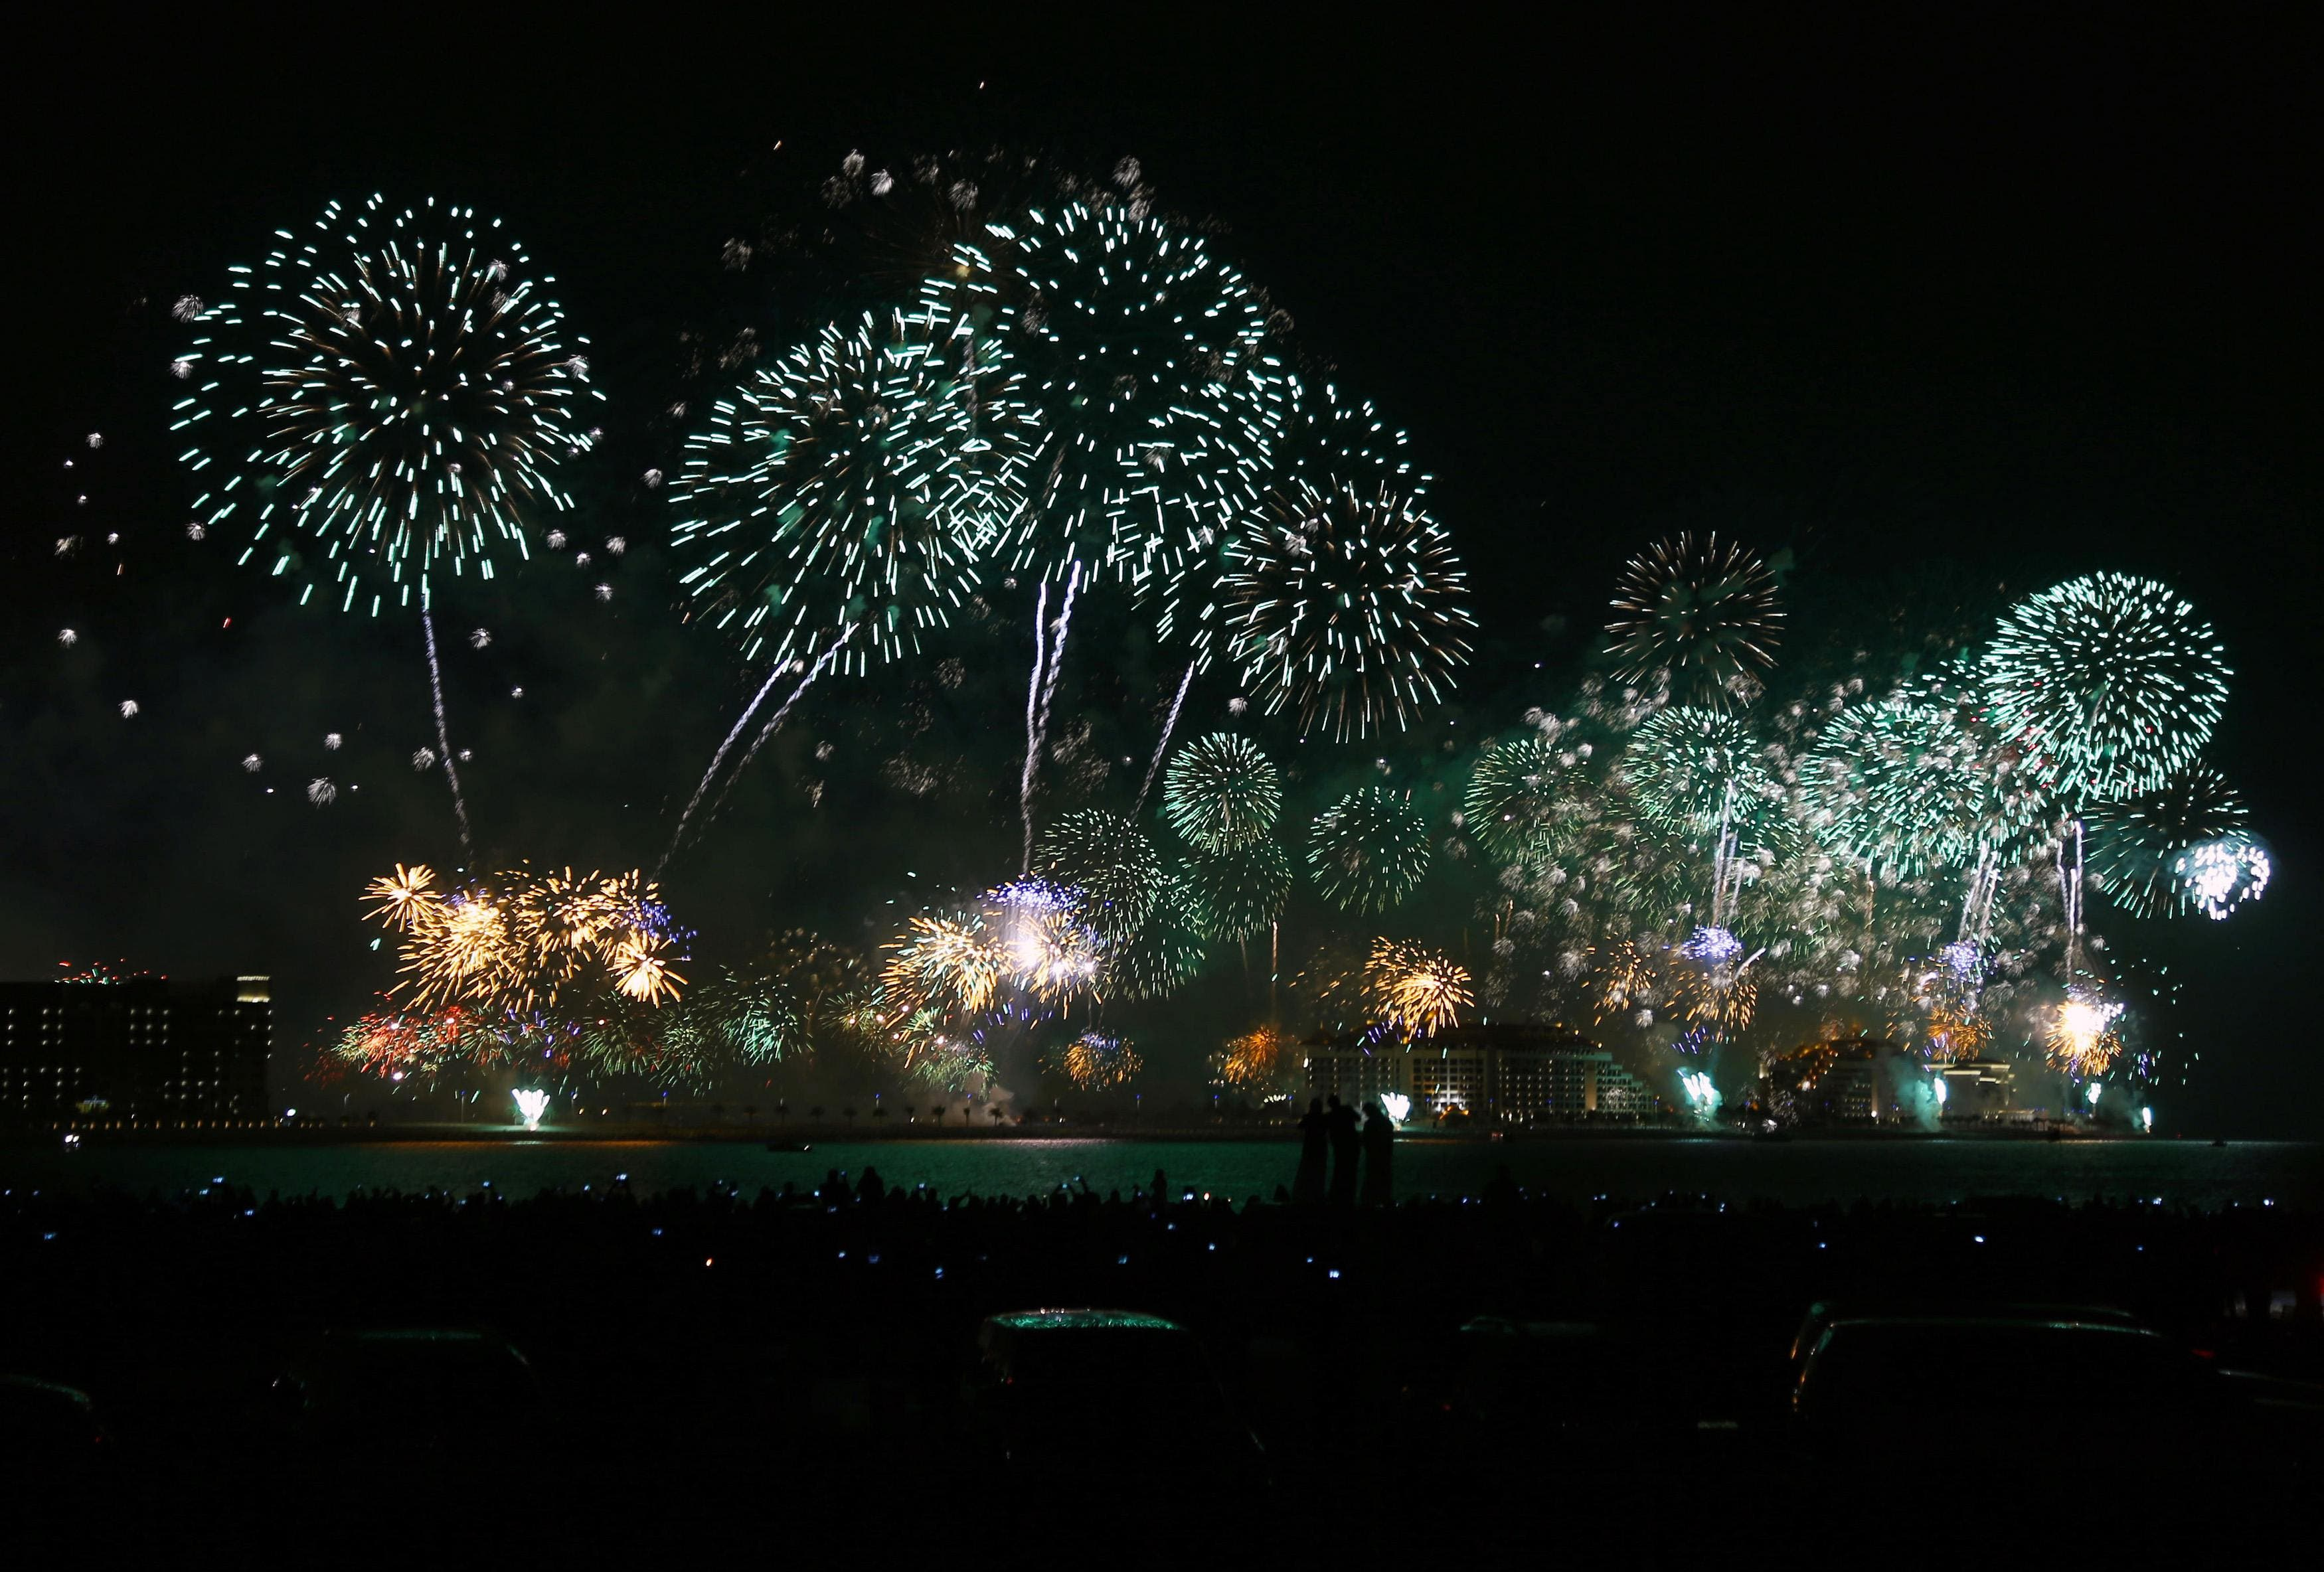 Dubai's New Year Fireworks